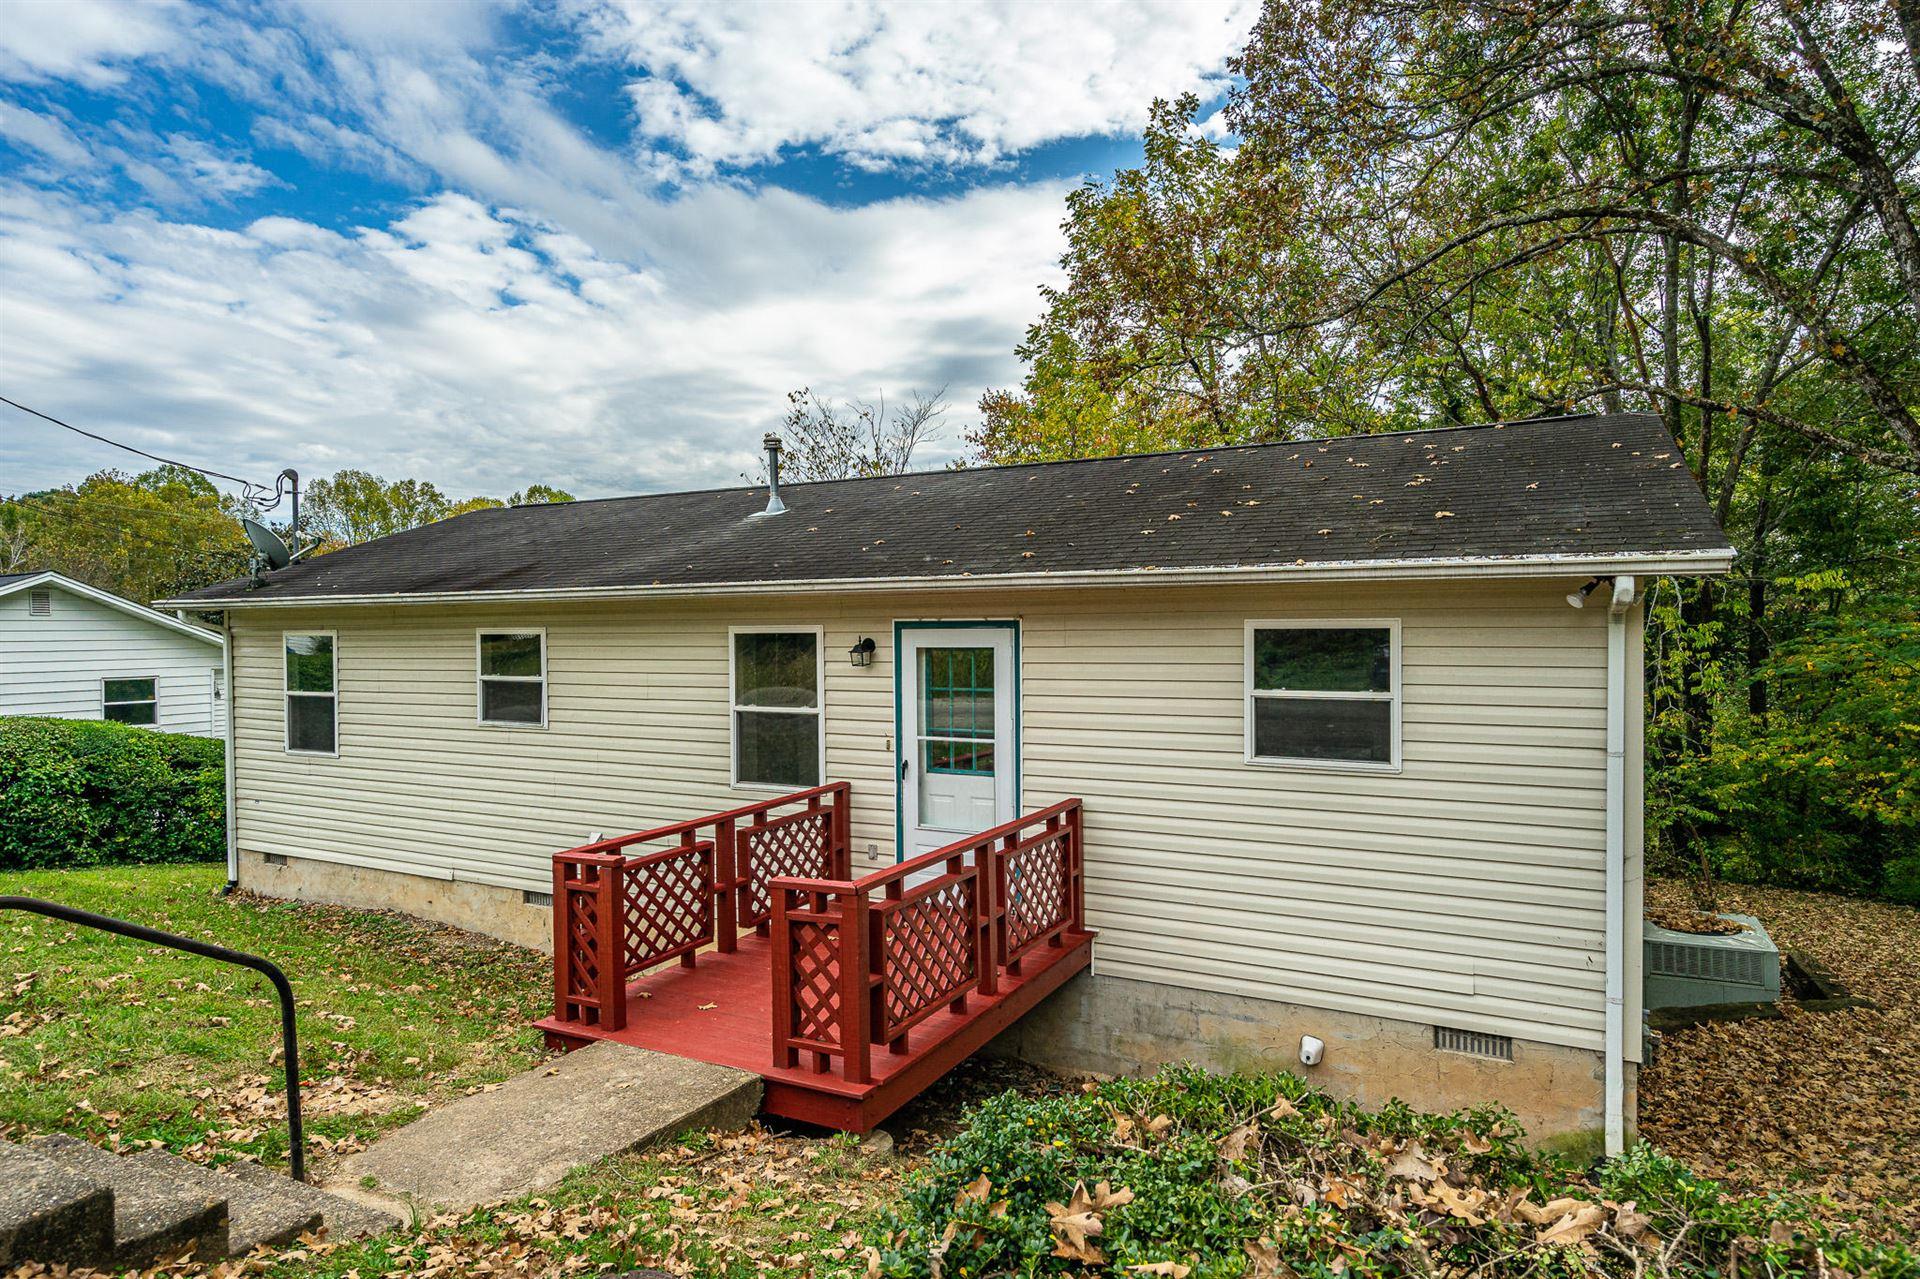 Photo of 103 Mayfair Lane, Oak Ridge, TN 37830 (MLS # 1133294)